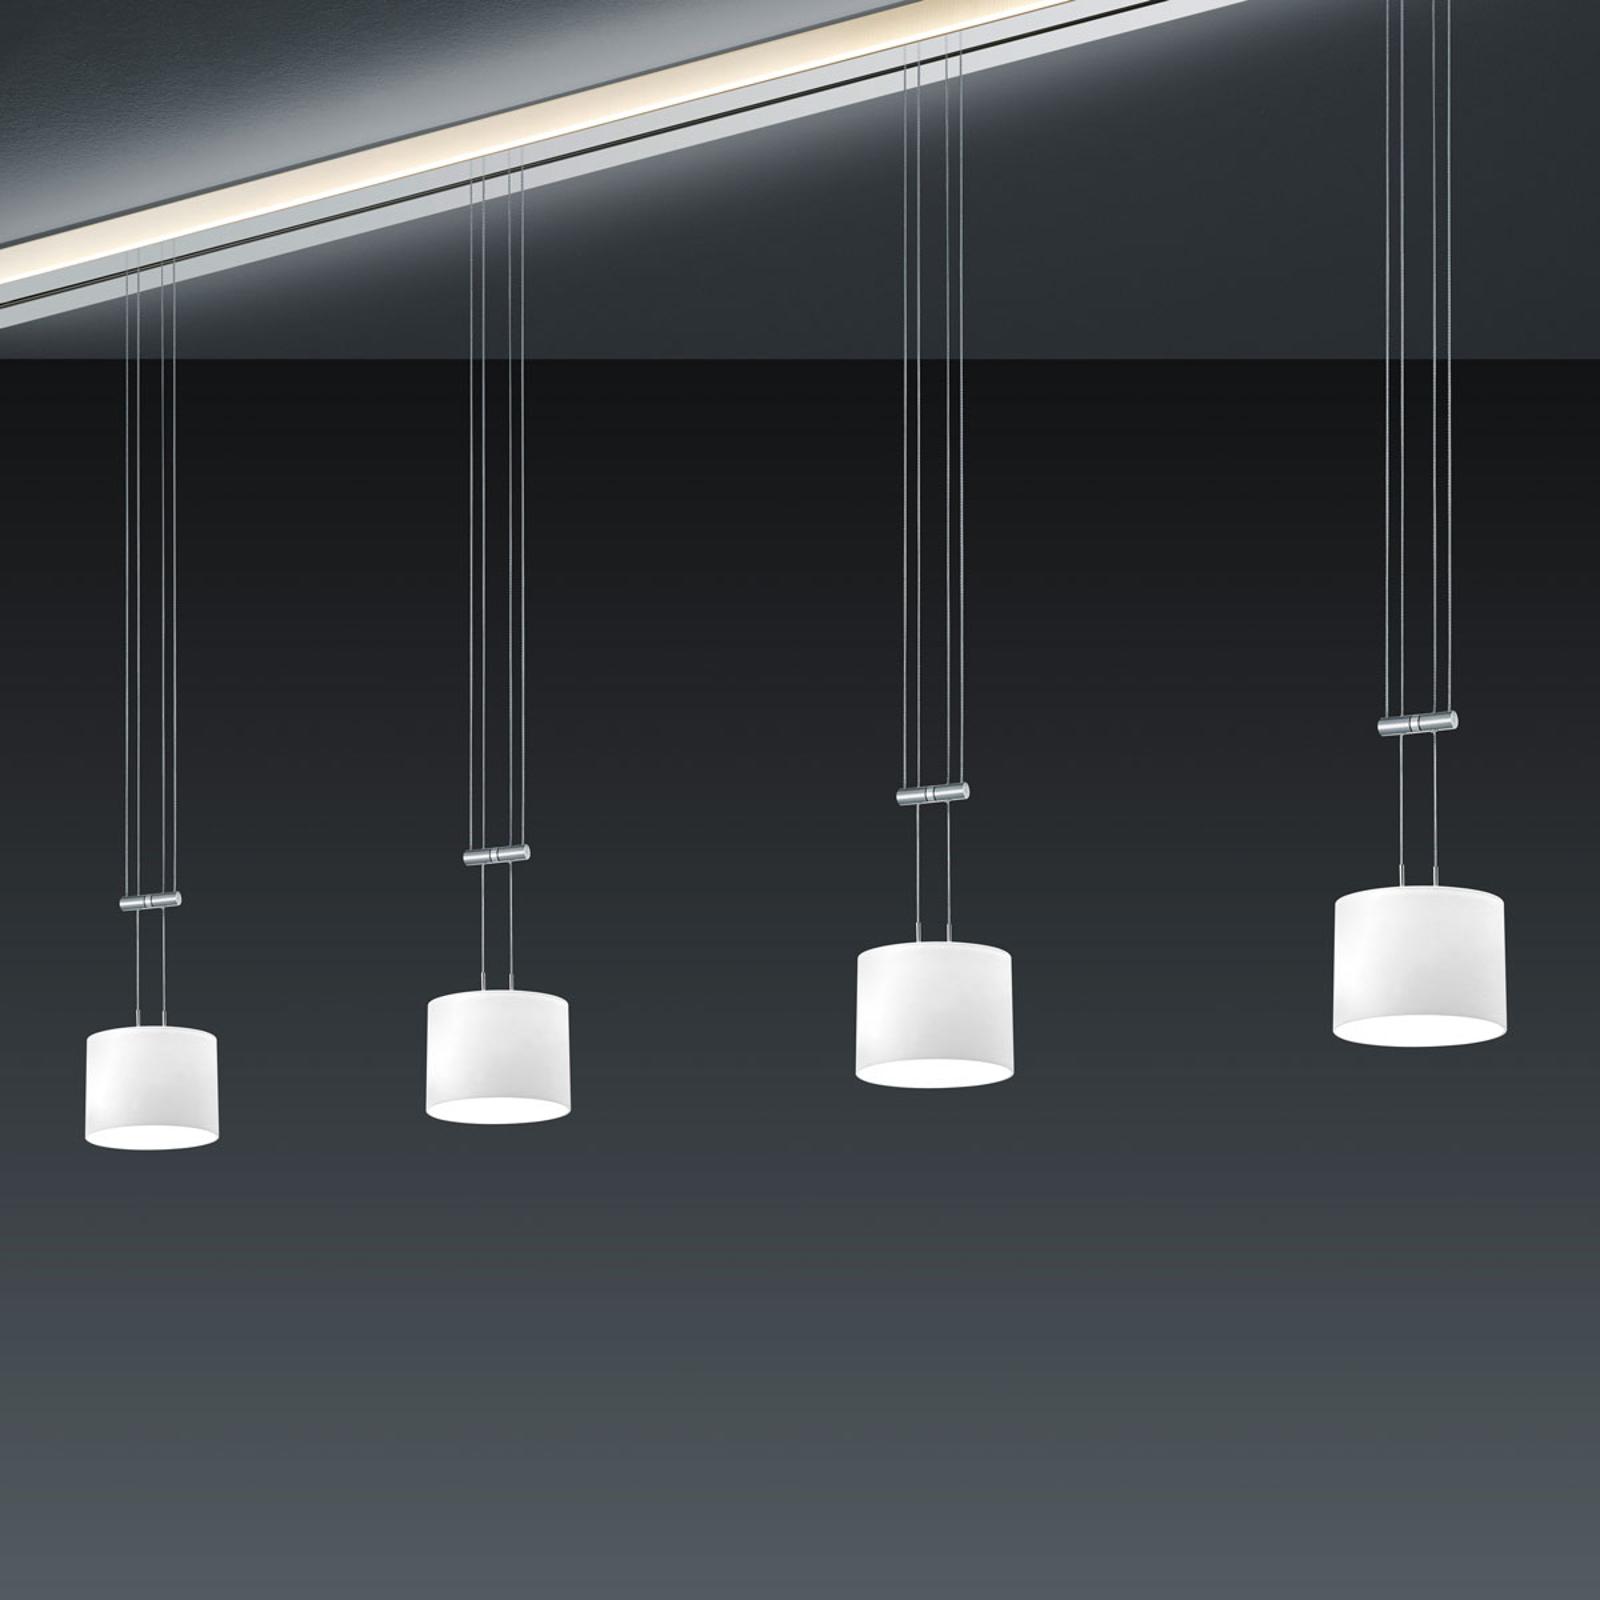 BANKAMP Strada Gracia sospensione 4 luci, 185 cm